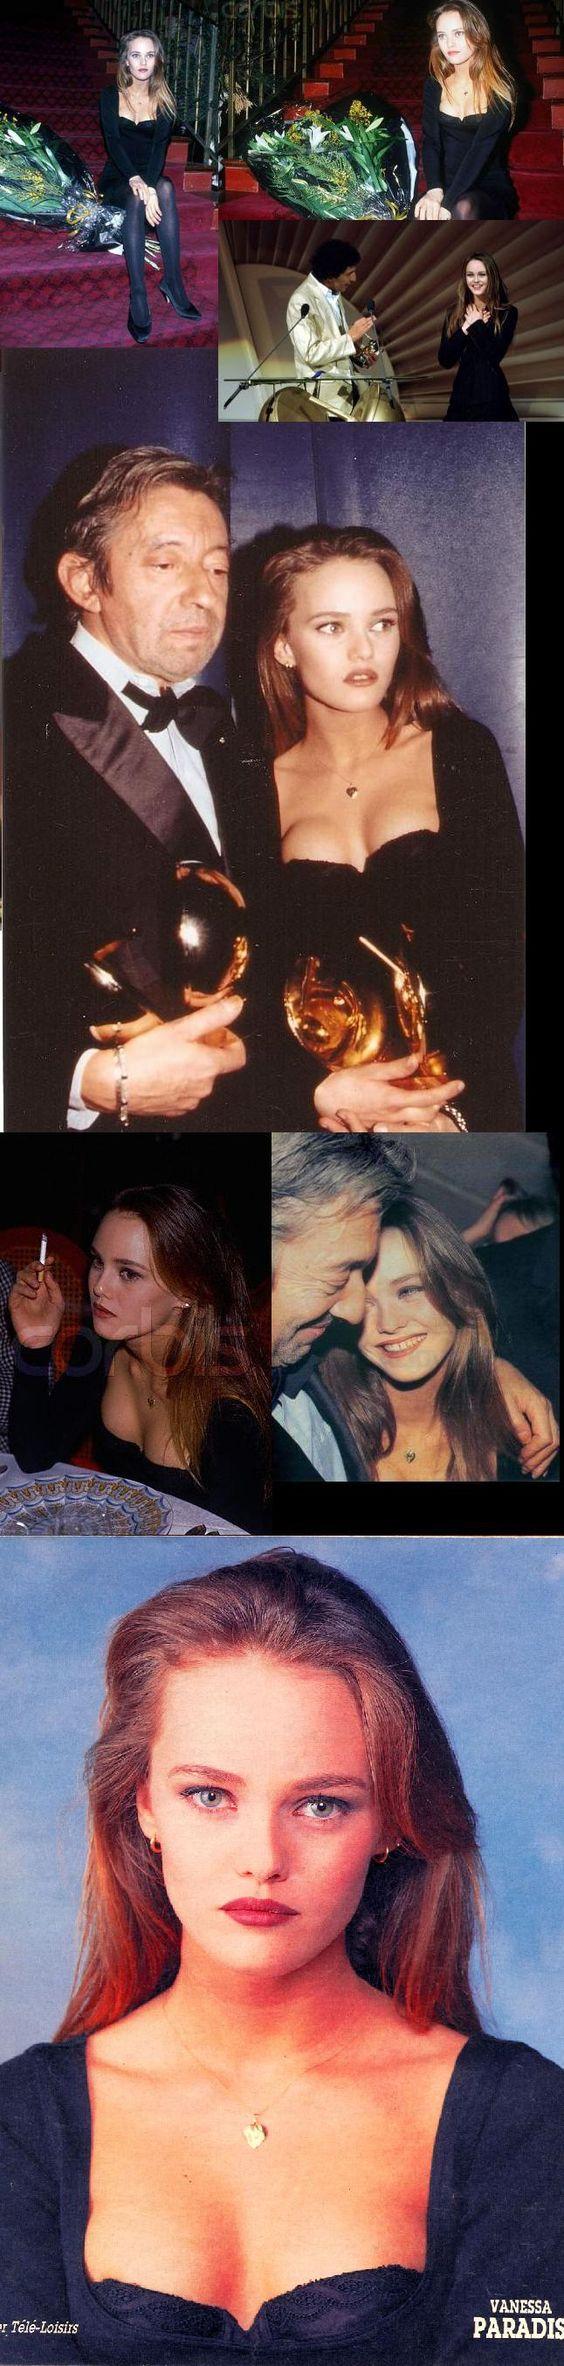 Vanessa Paradis Victoires de la musique 1990